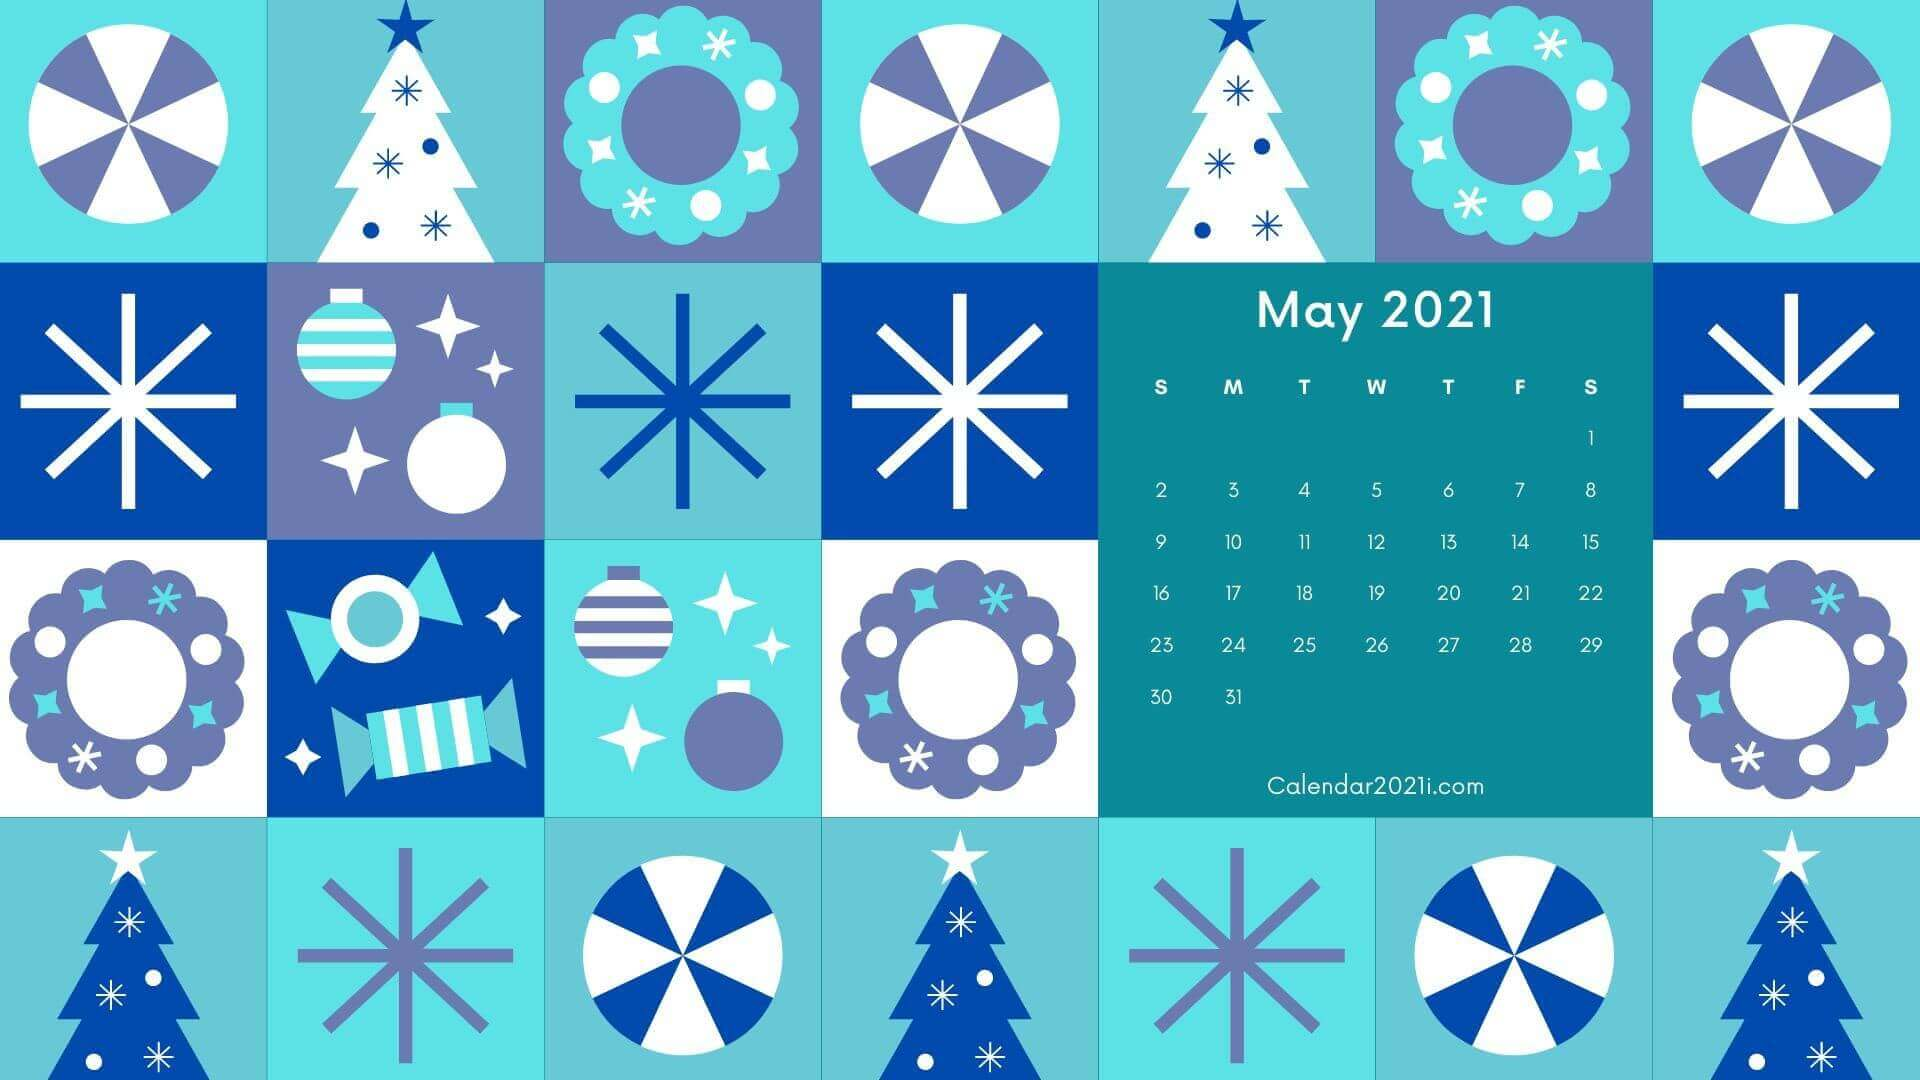 May 2021 Calendar Wallpaper For Laptop